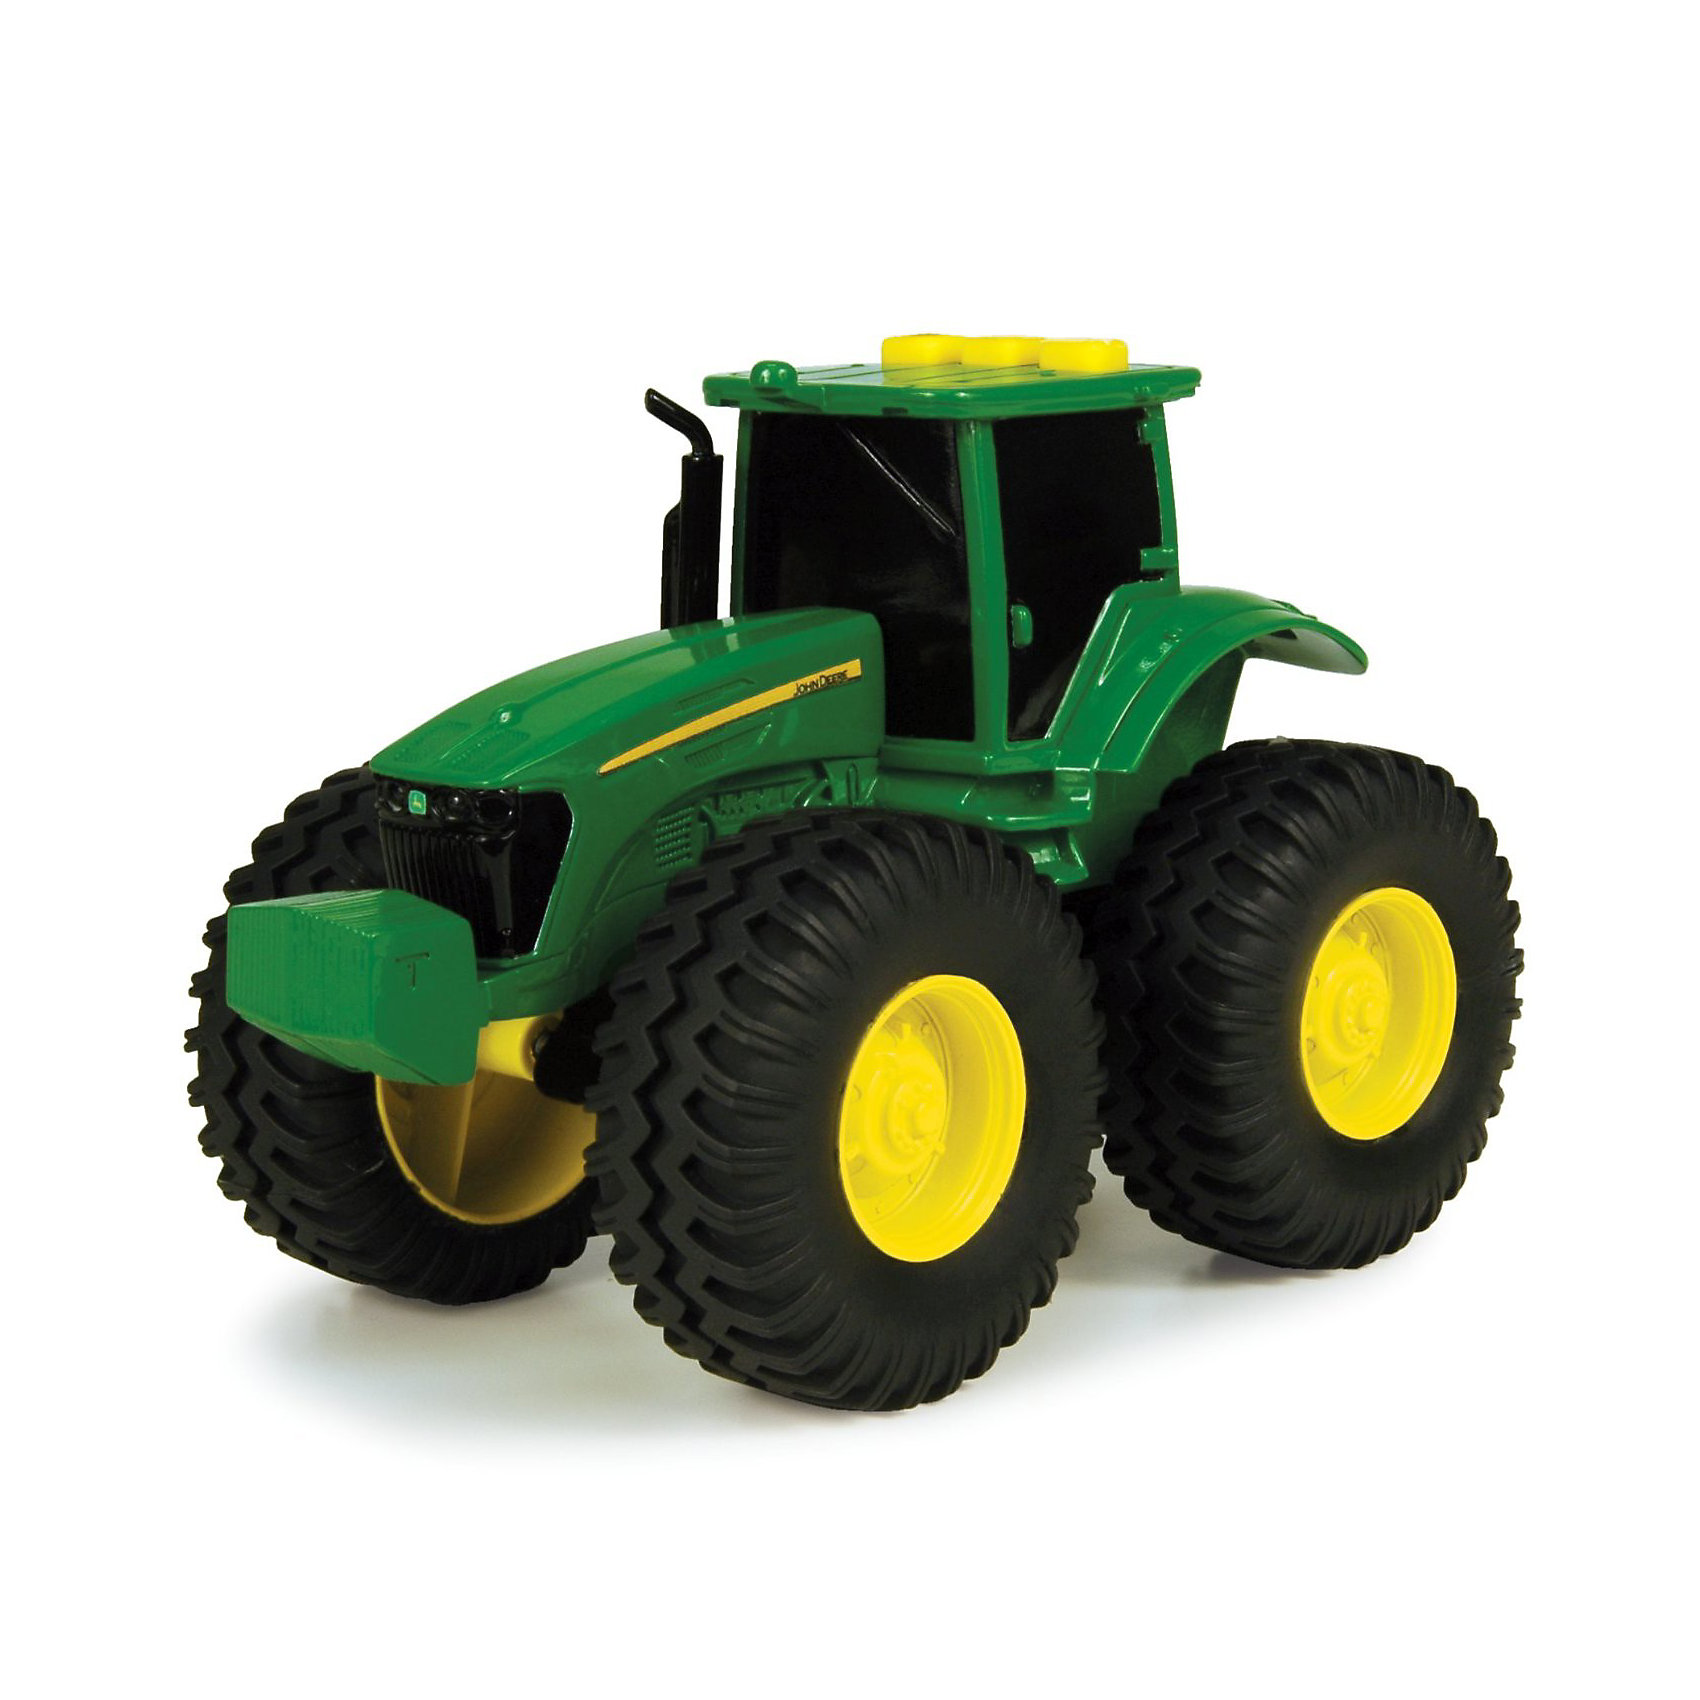 TOMY Трактор с большими колесами, TOMY машины tomy john deere трактор monster treads с большими колесами и вибрацией